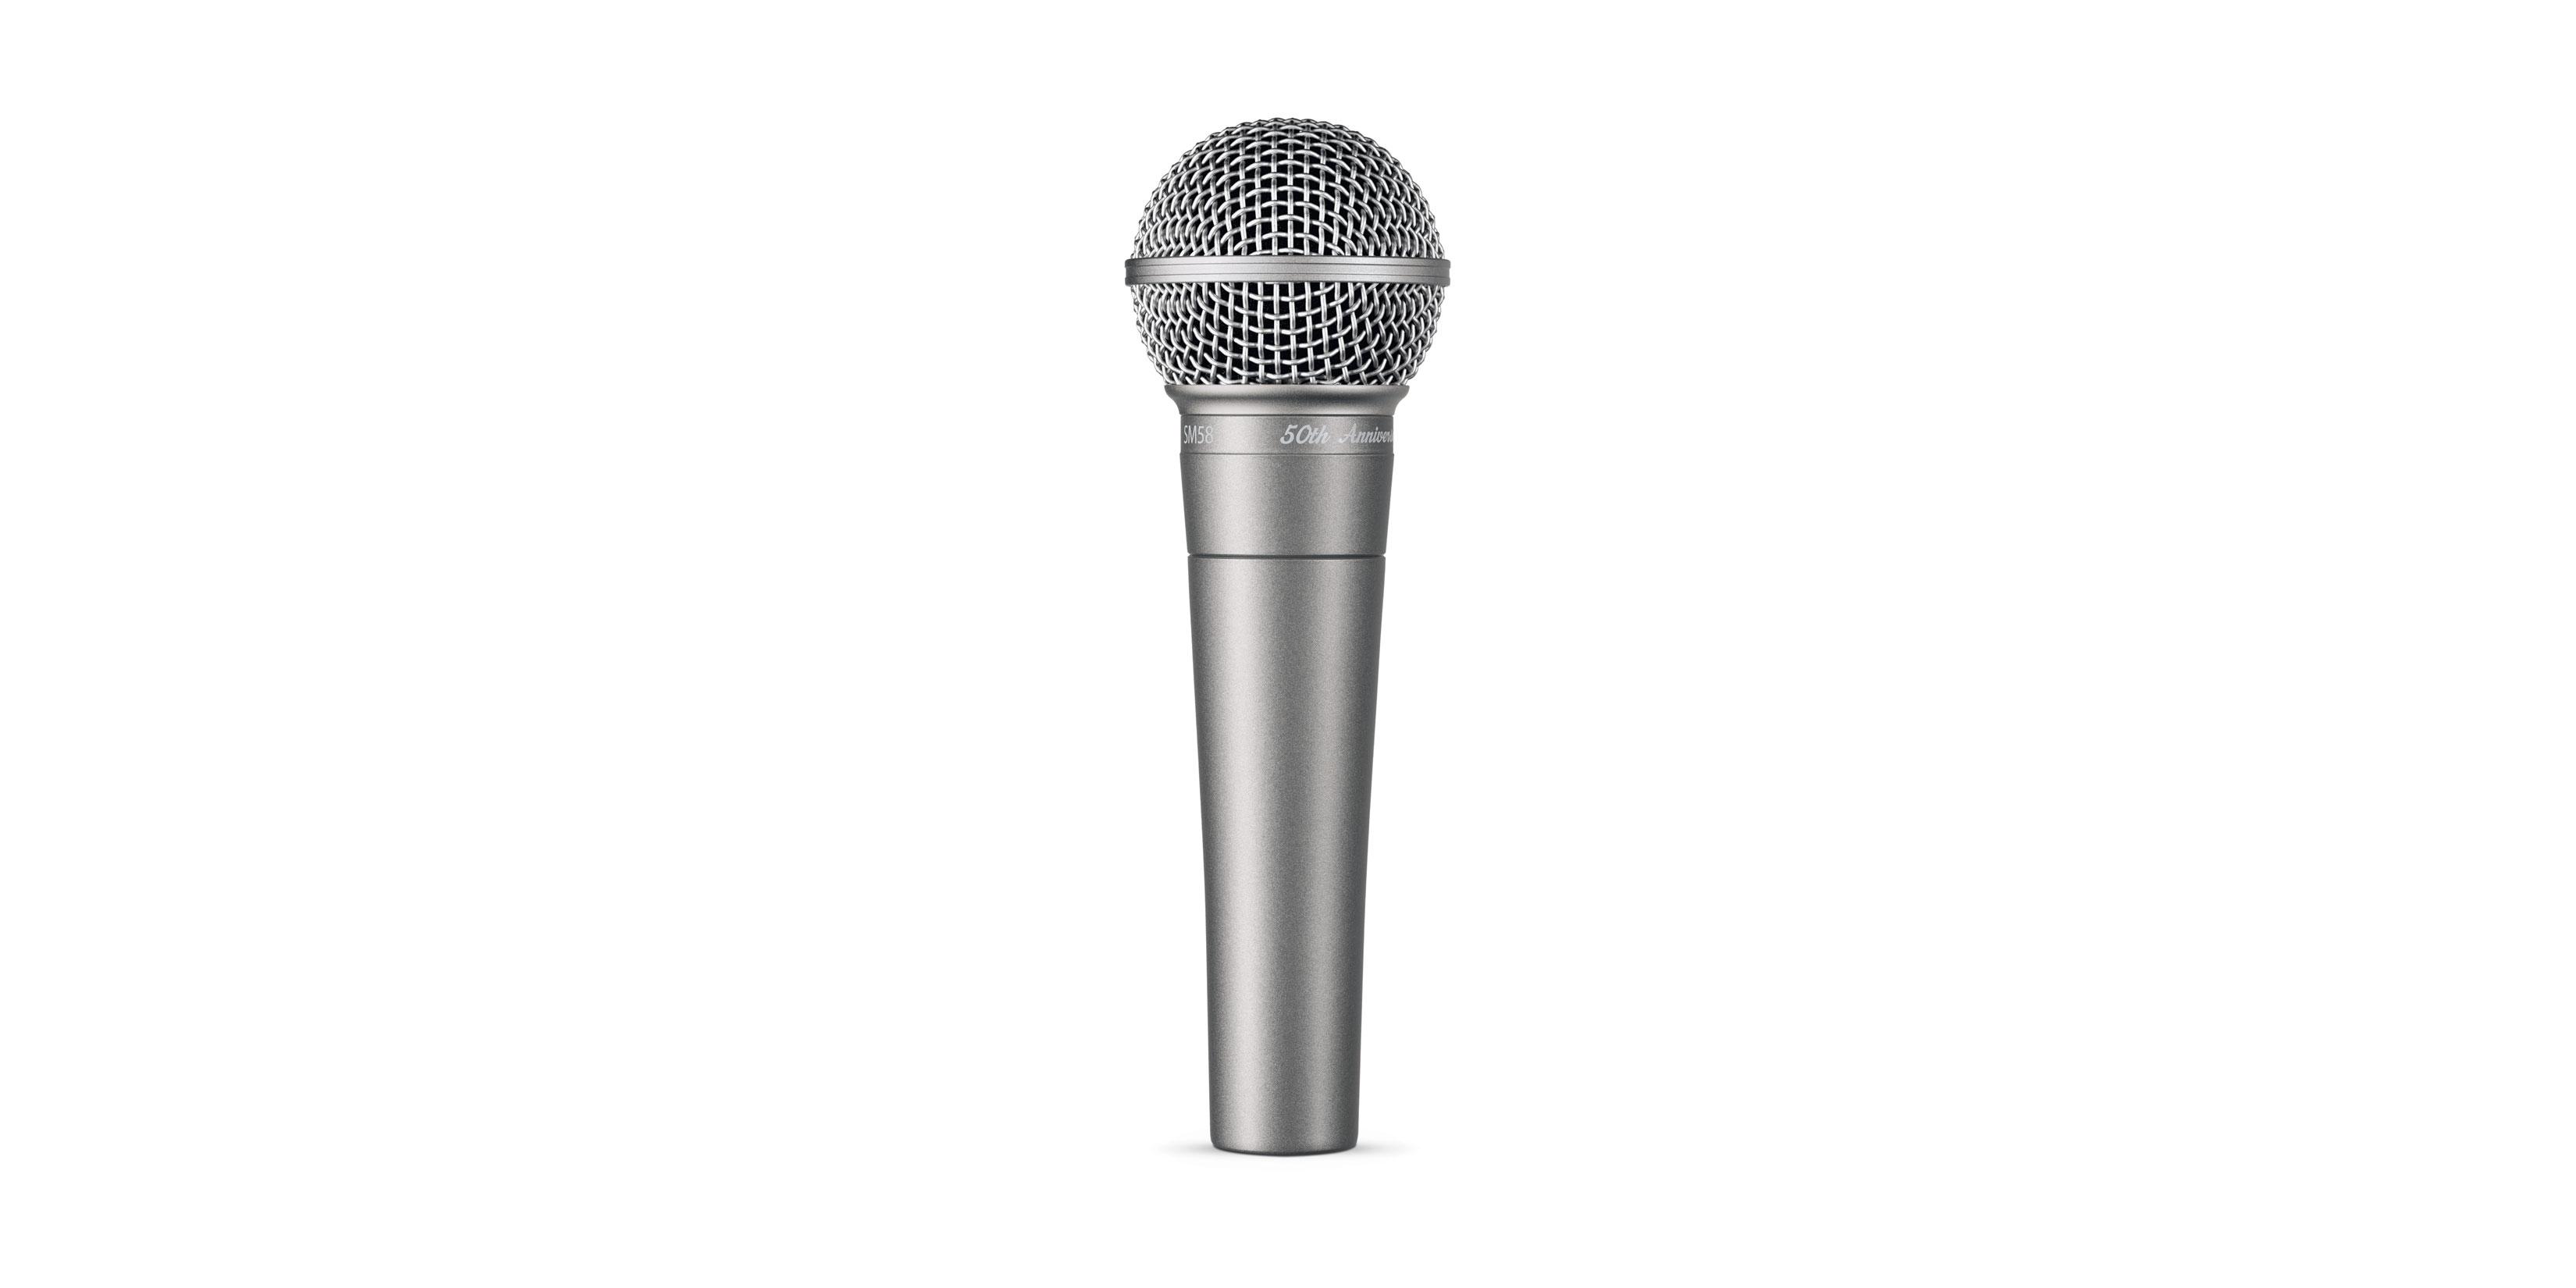 3300x1650 Sm58 50a Vocal Microphone Shure Americas